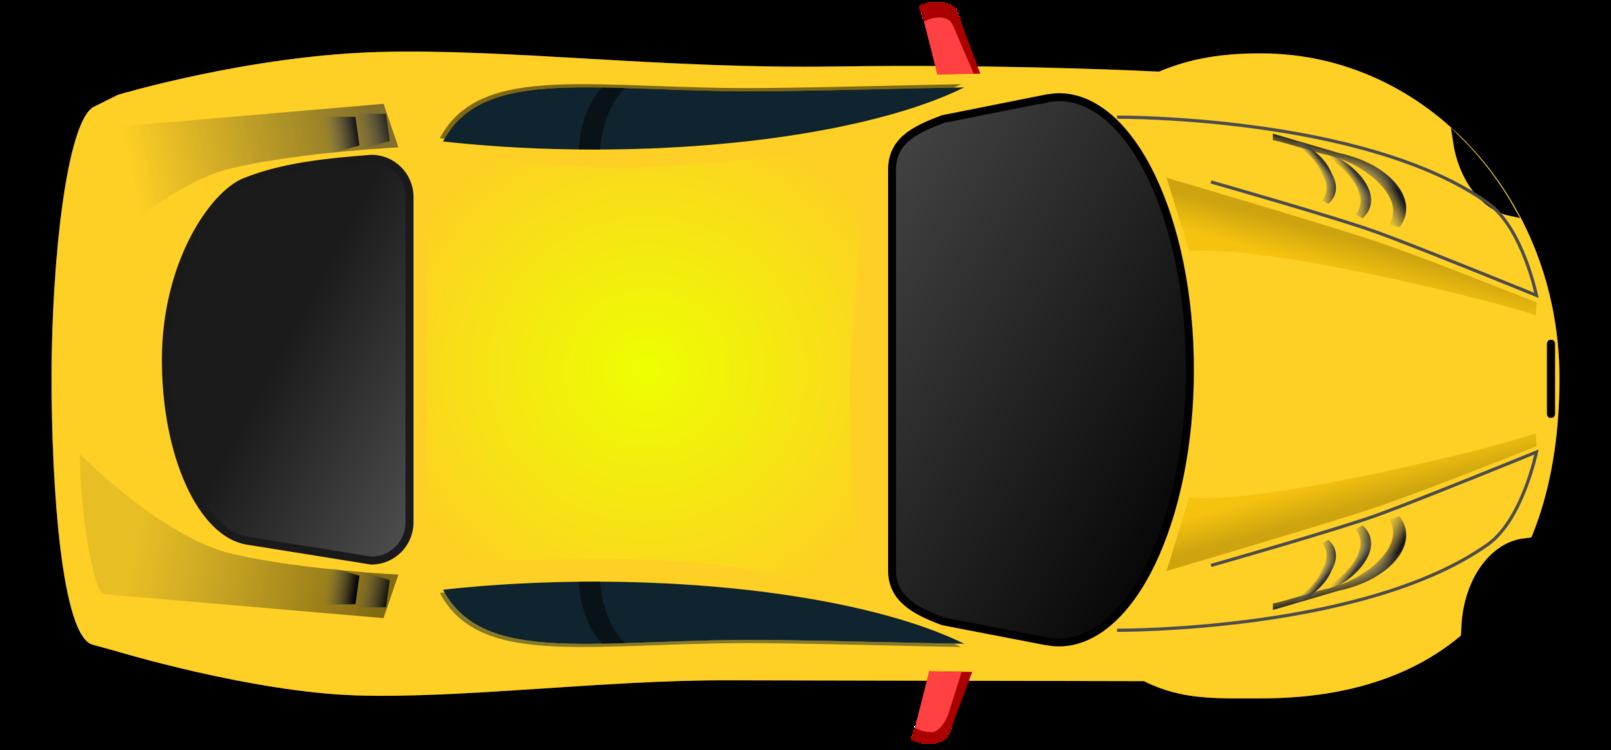 Vehicle Door,Automotive Exterior,Compact Car